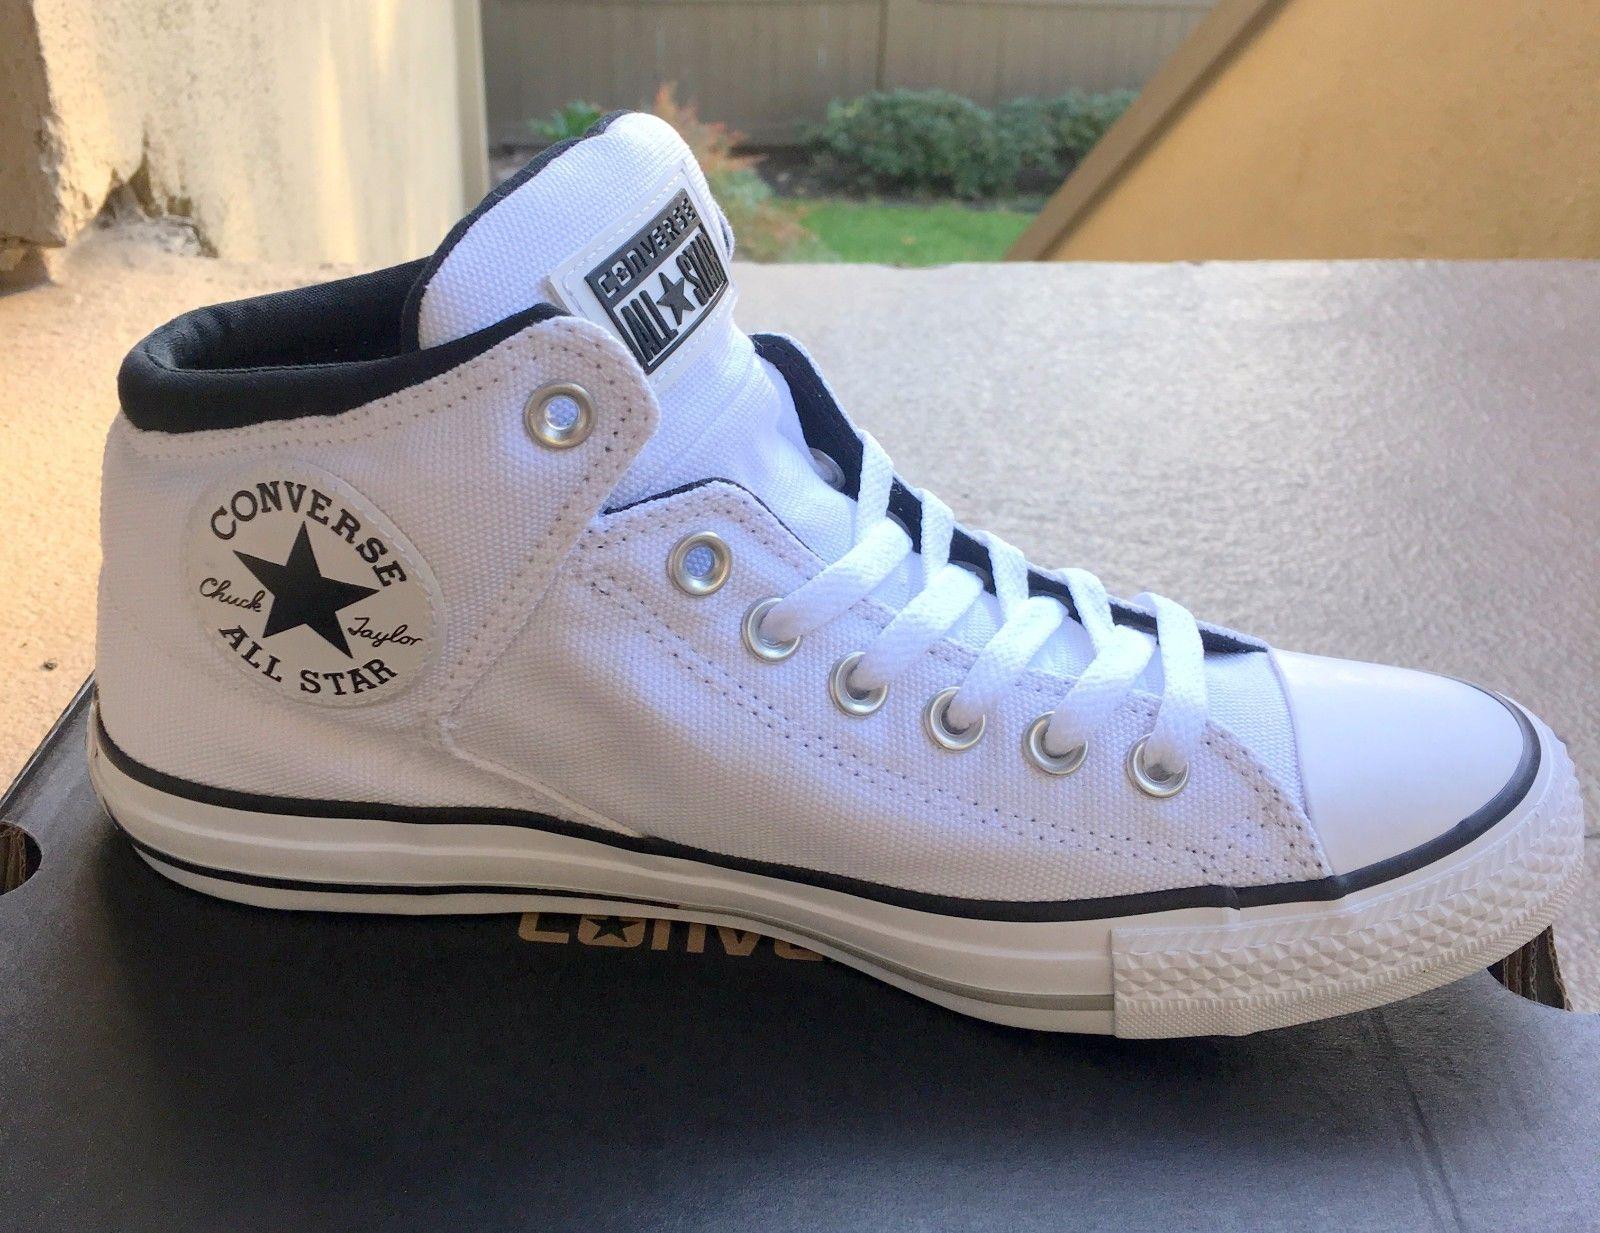 Converse jack purcell ราคา